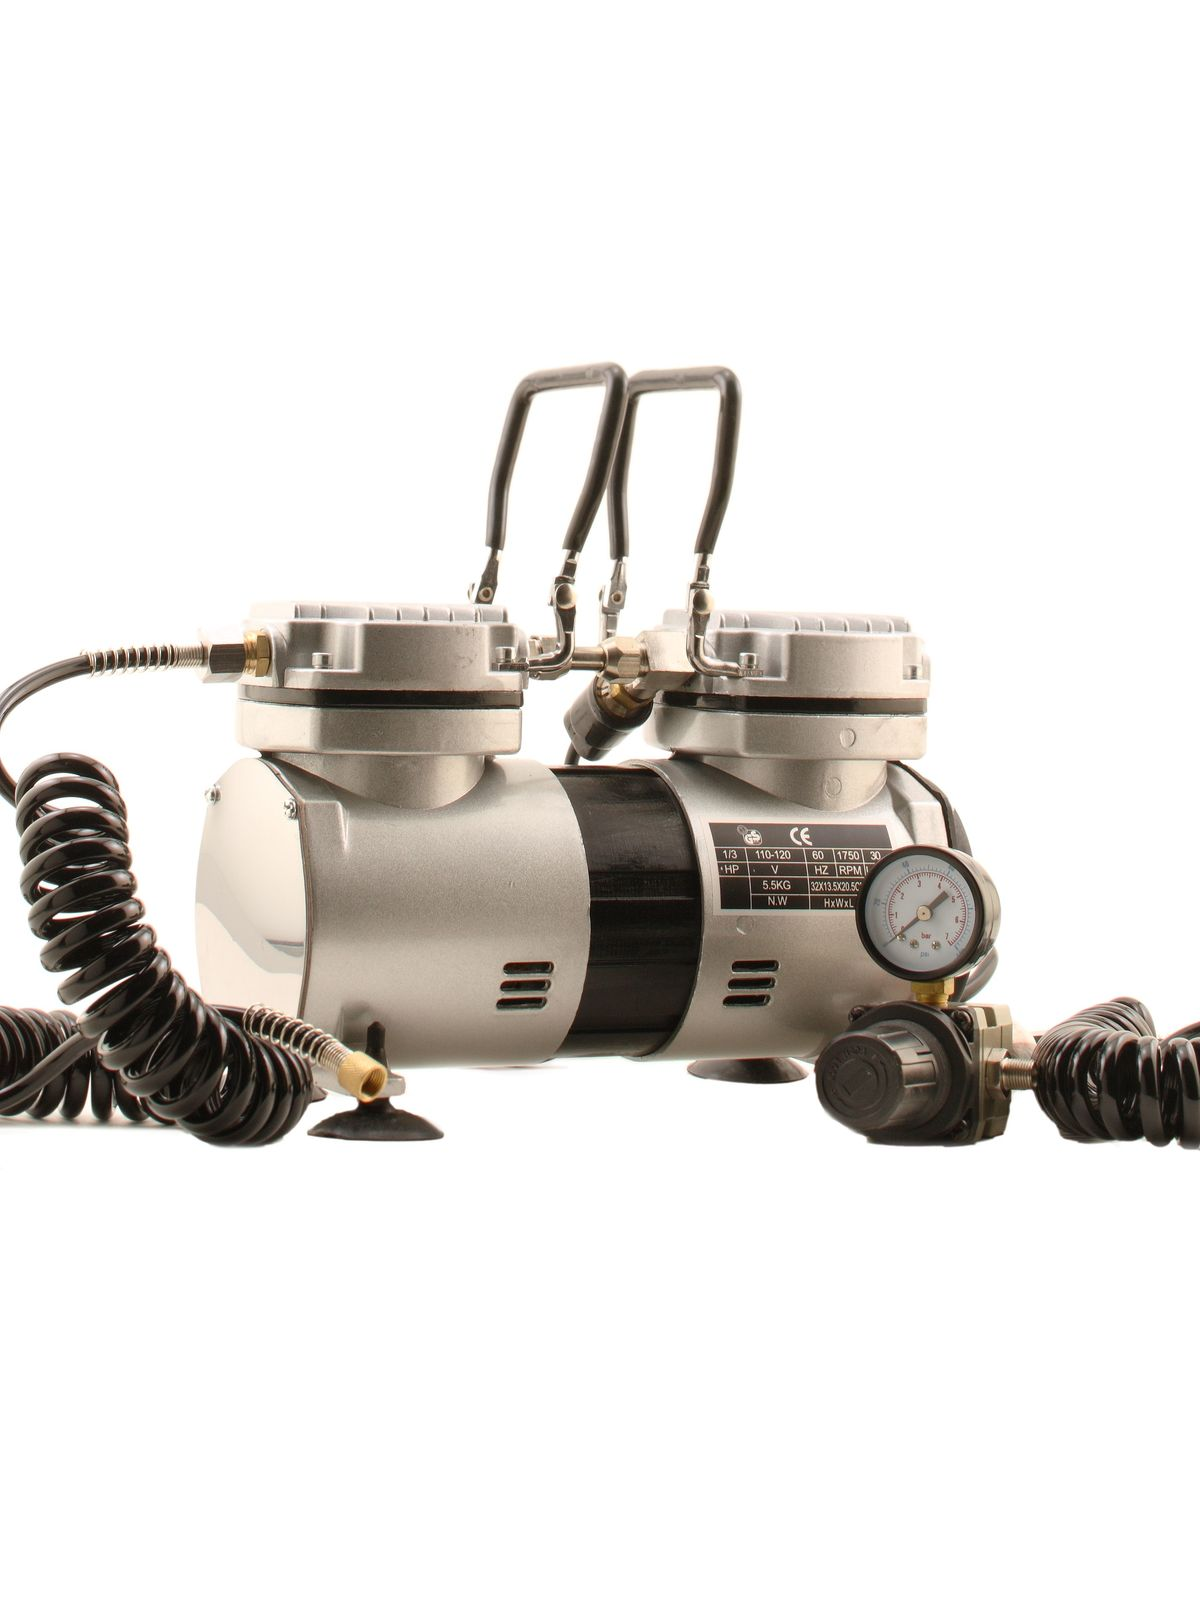 Scorpion II Compressor